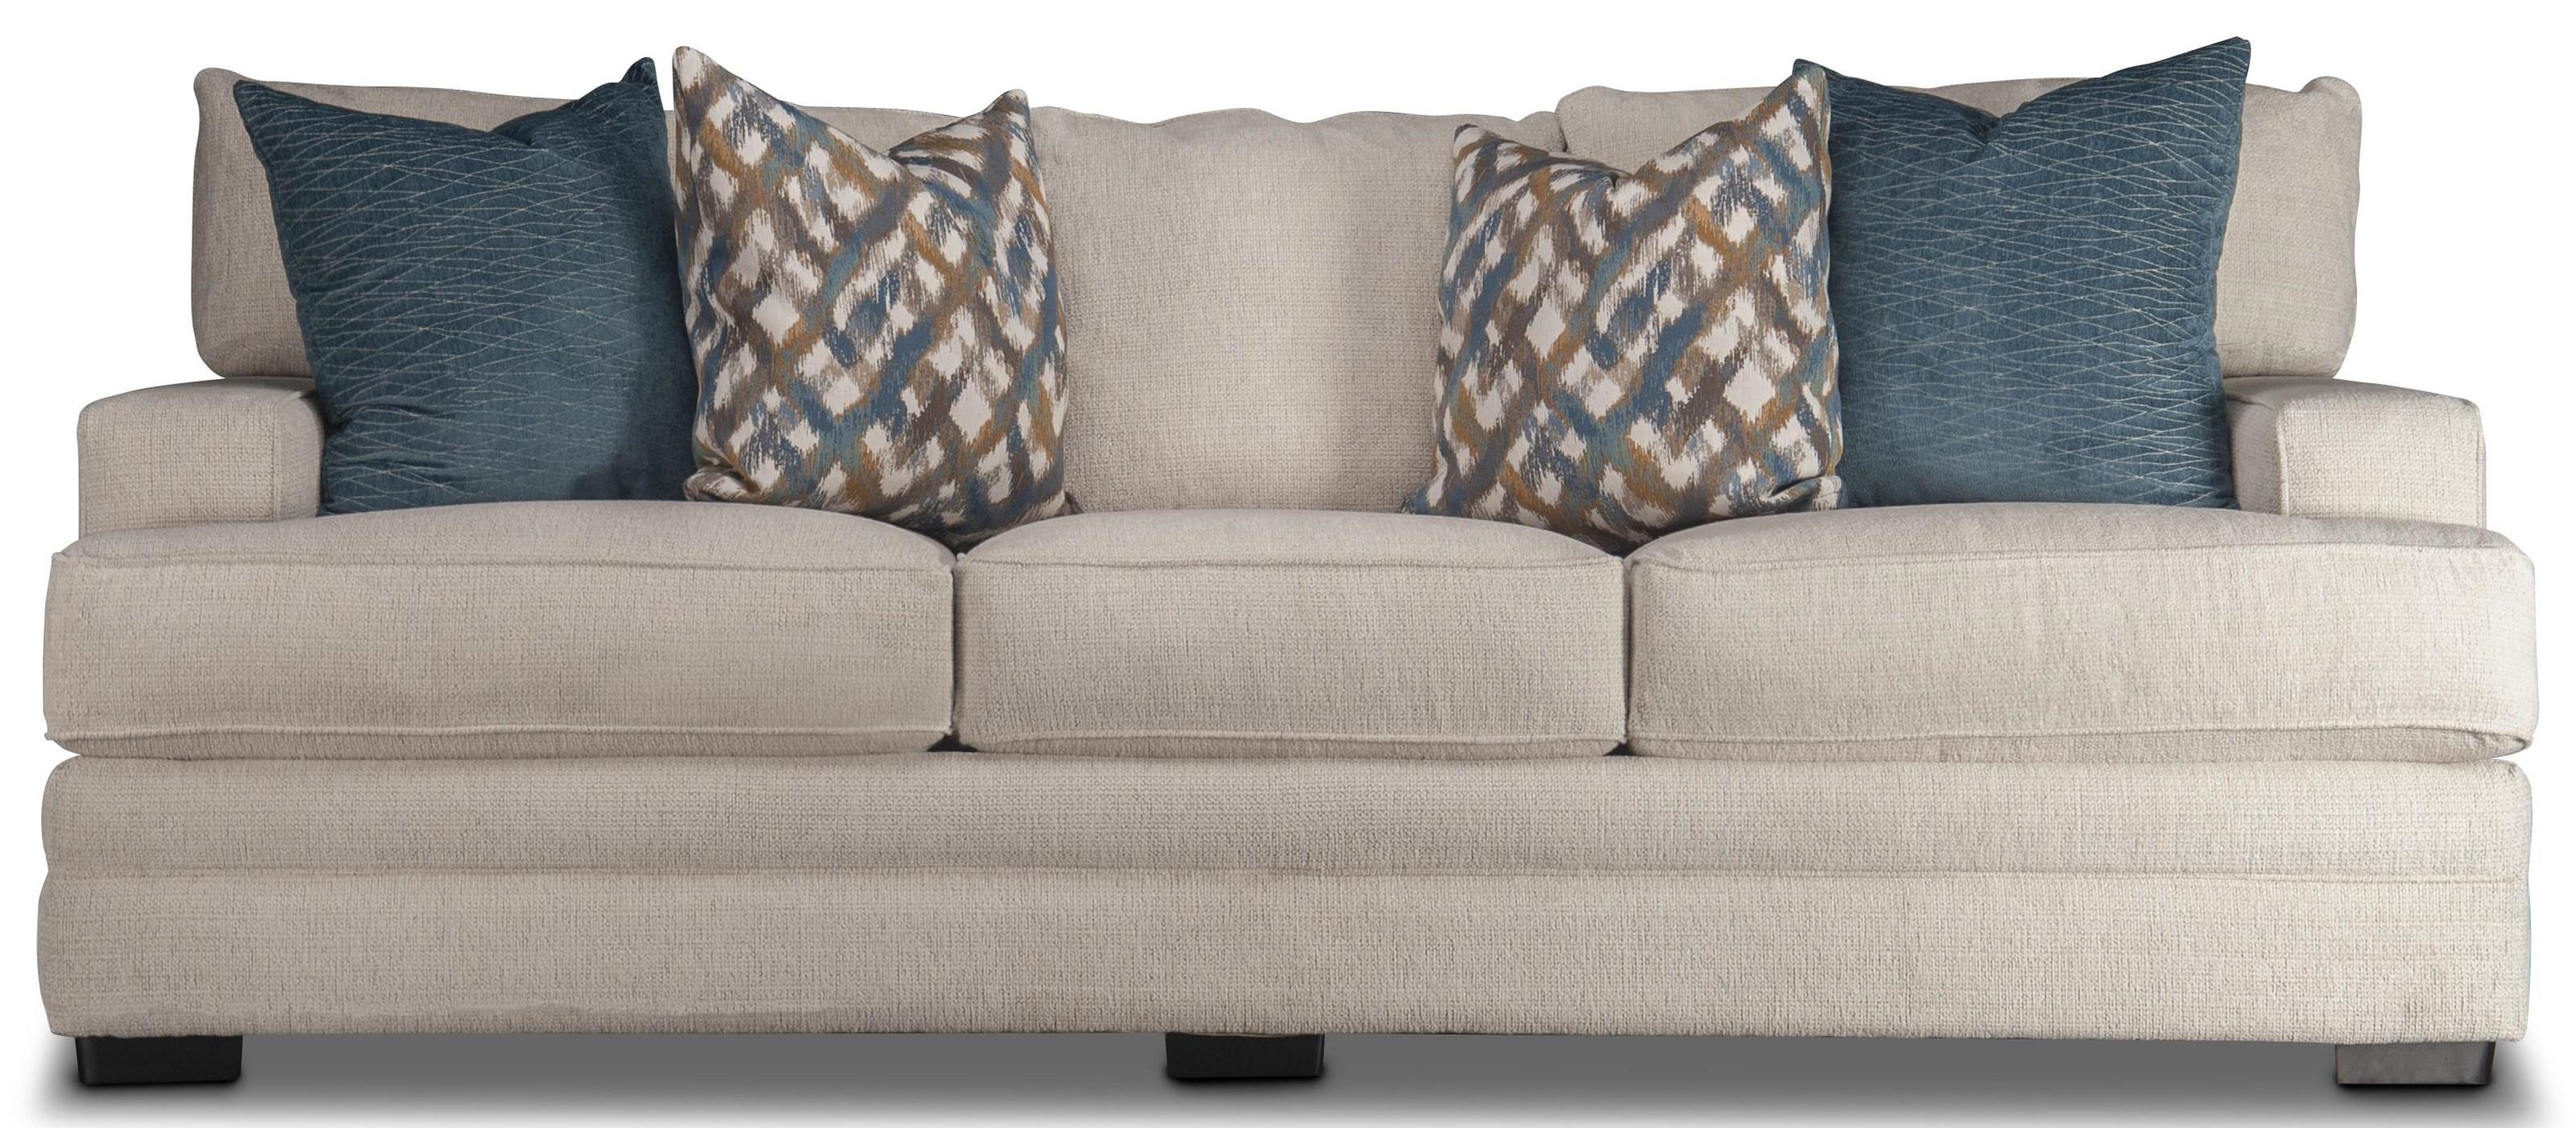 Redding Redding Sofa by Franklin at Morris Home